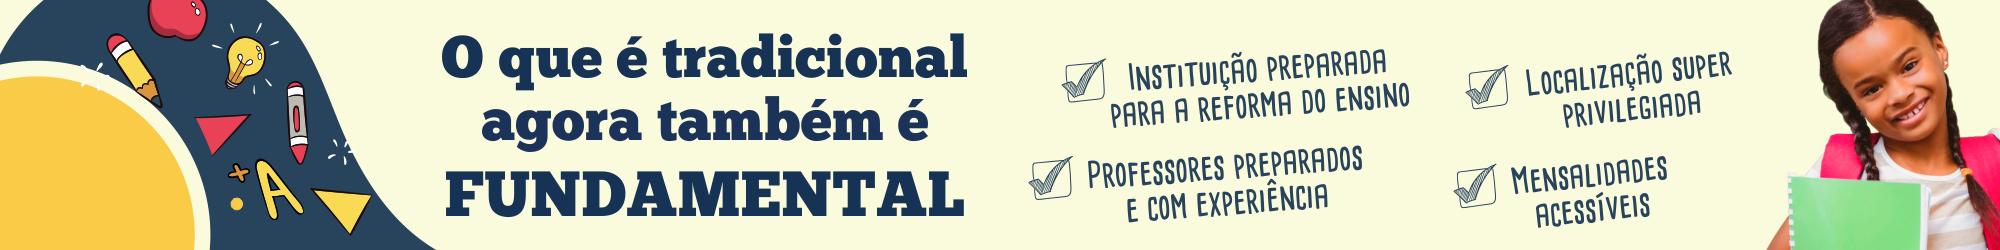 Fundamental - Banner horizontal